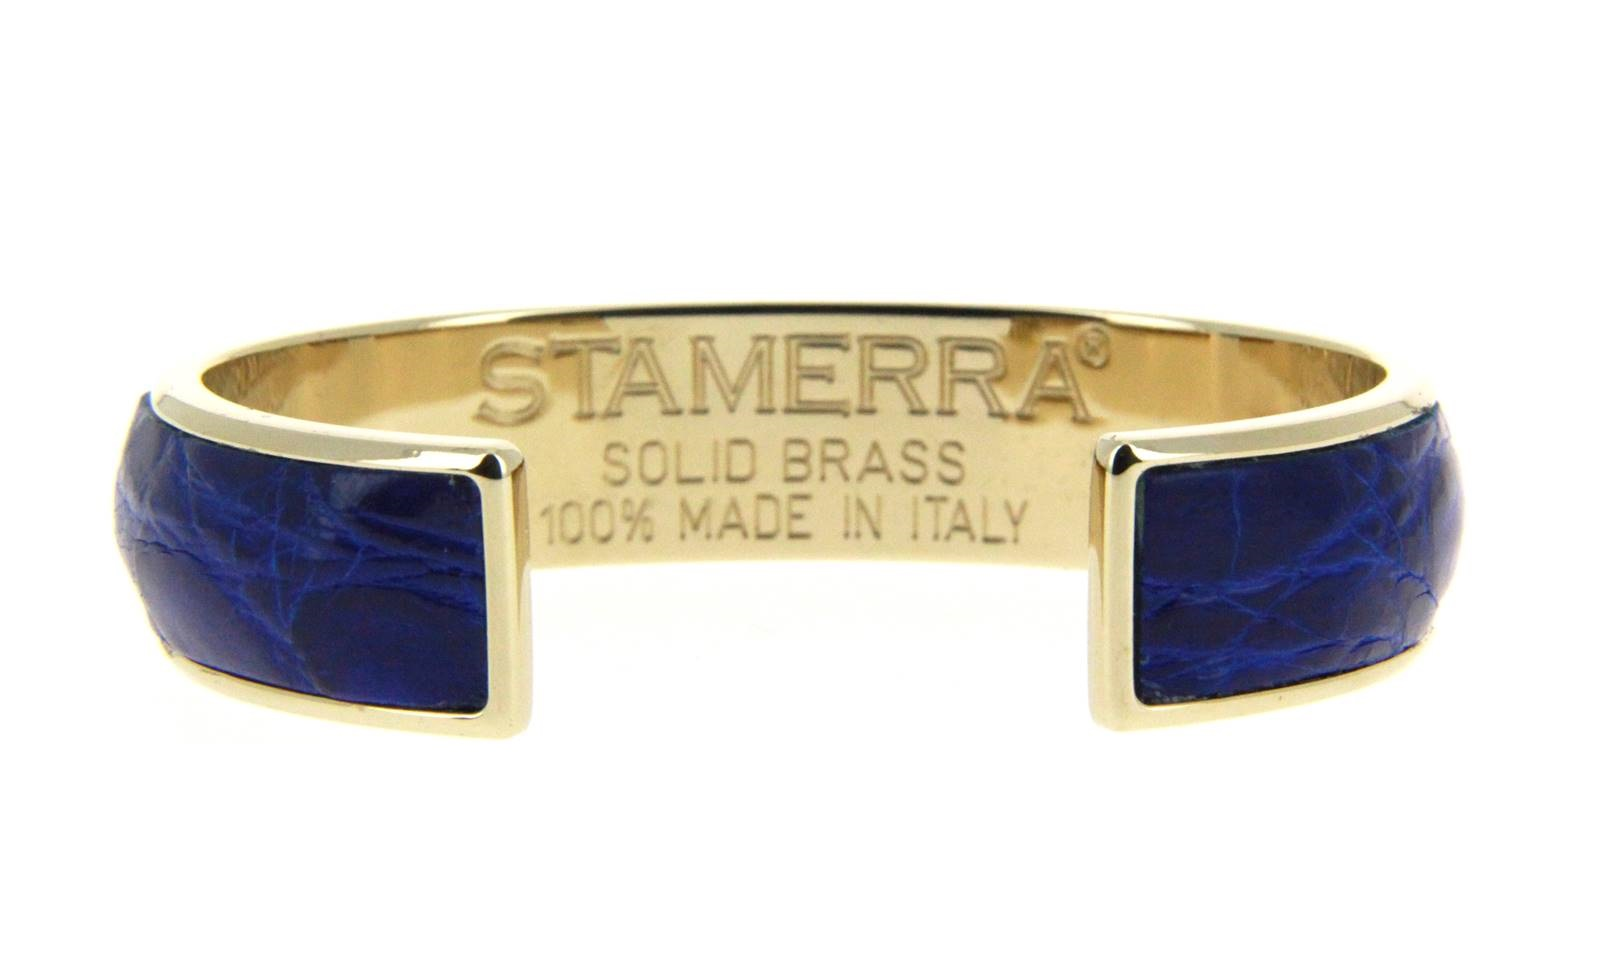 Stamerra bracelet VERO GENUINE CROCO GOLD ELETTRICO